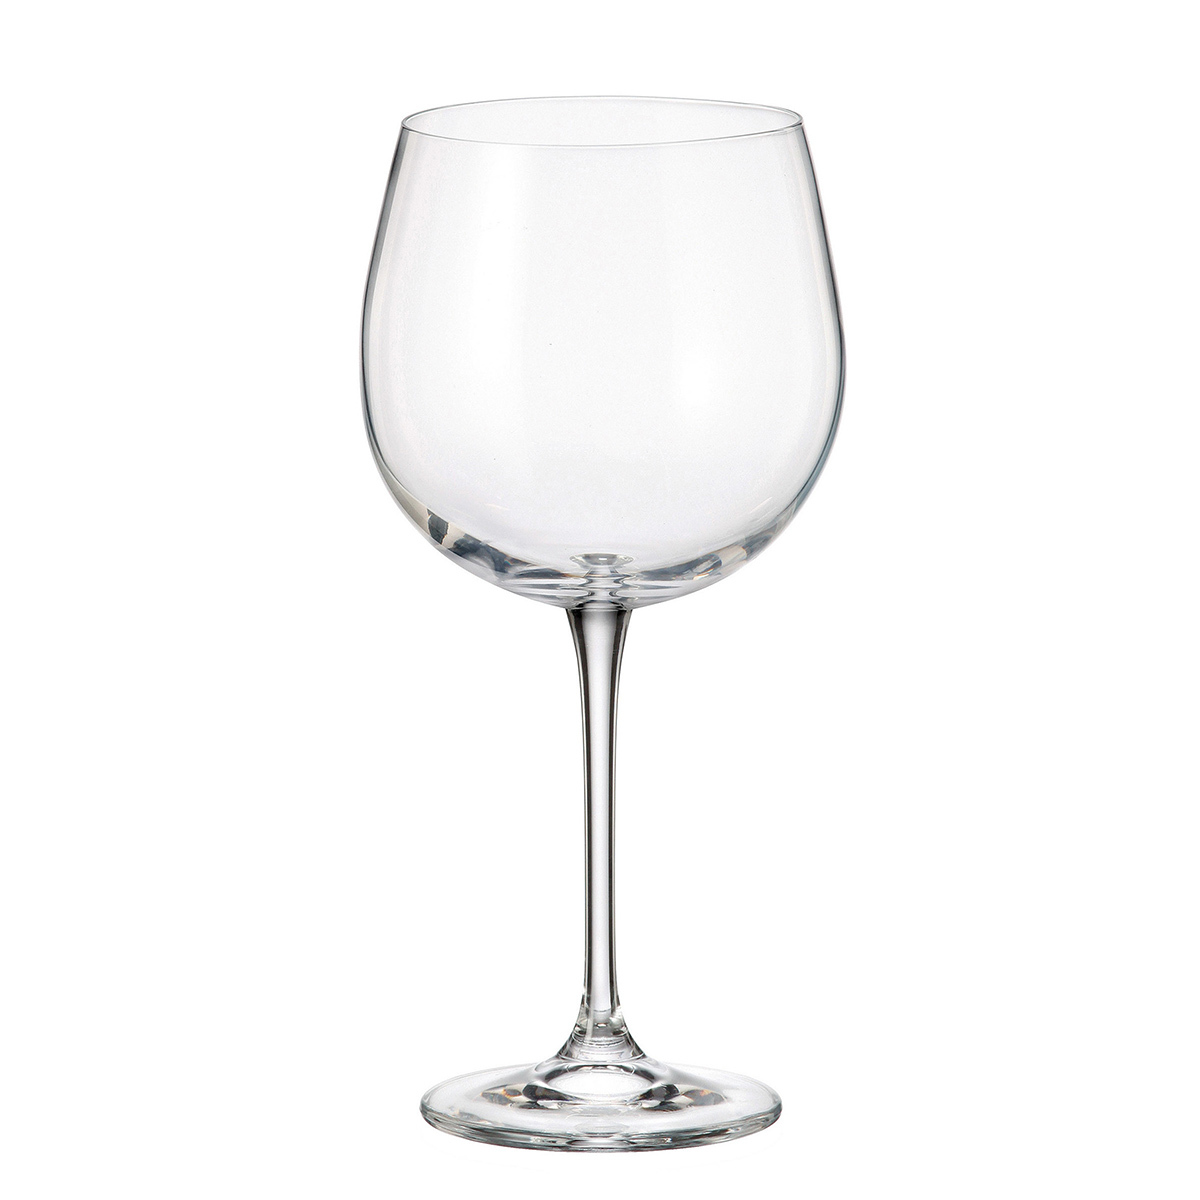 Набор из 6 бокалов для вина Crystalite Bohemia Fulica, 670 мл